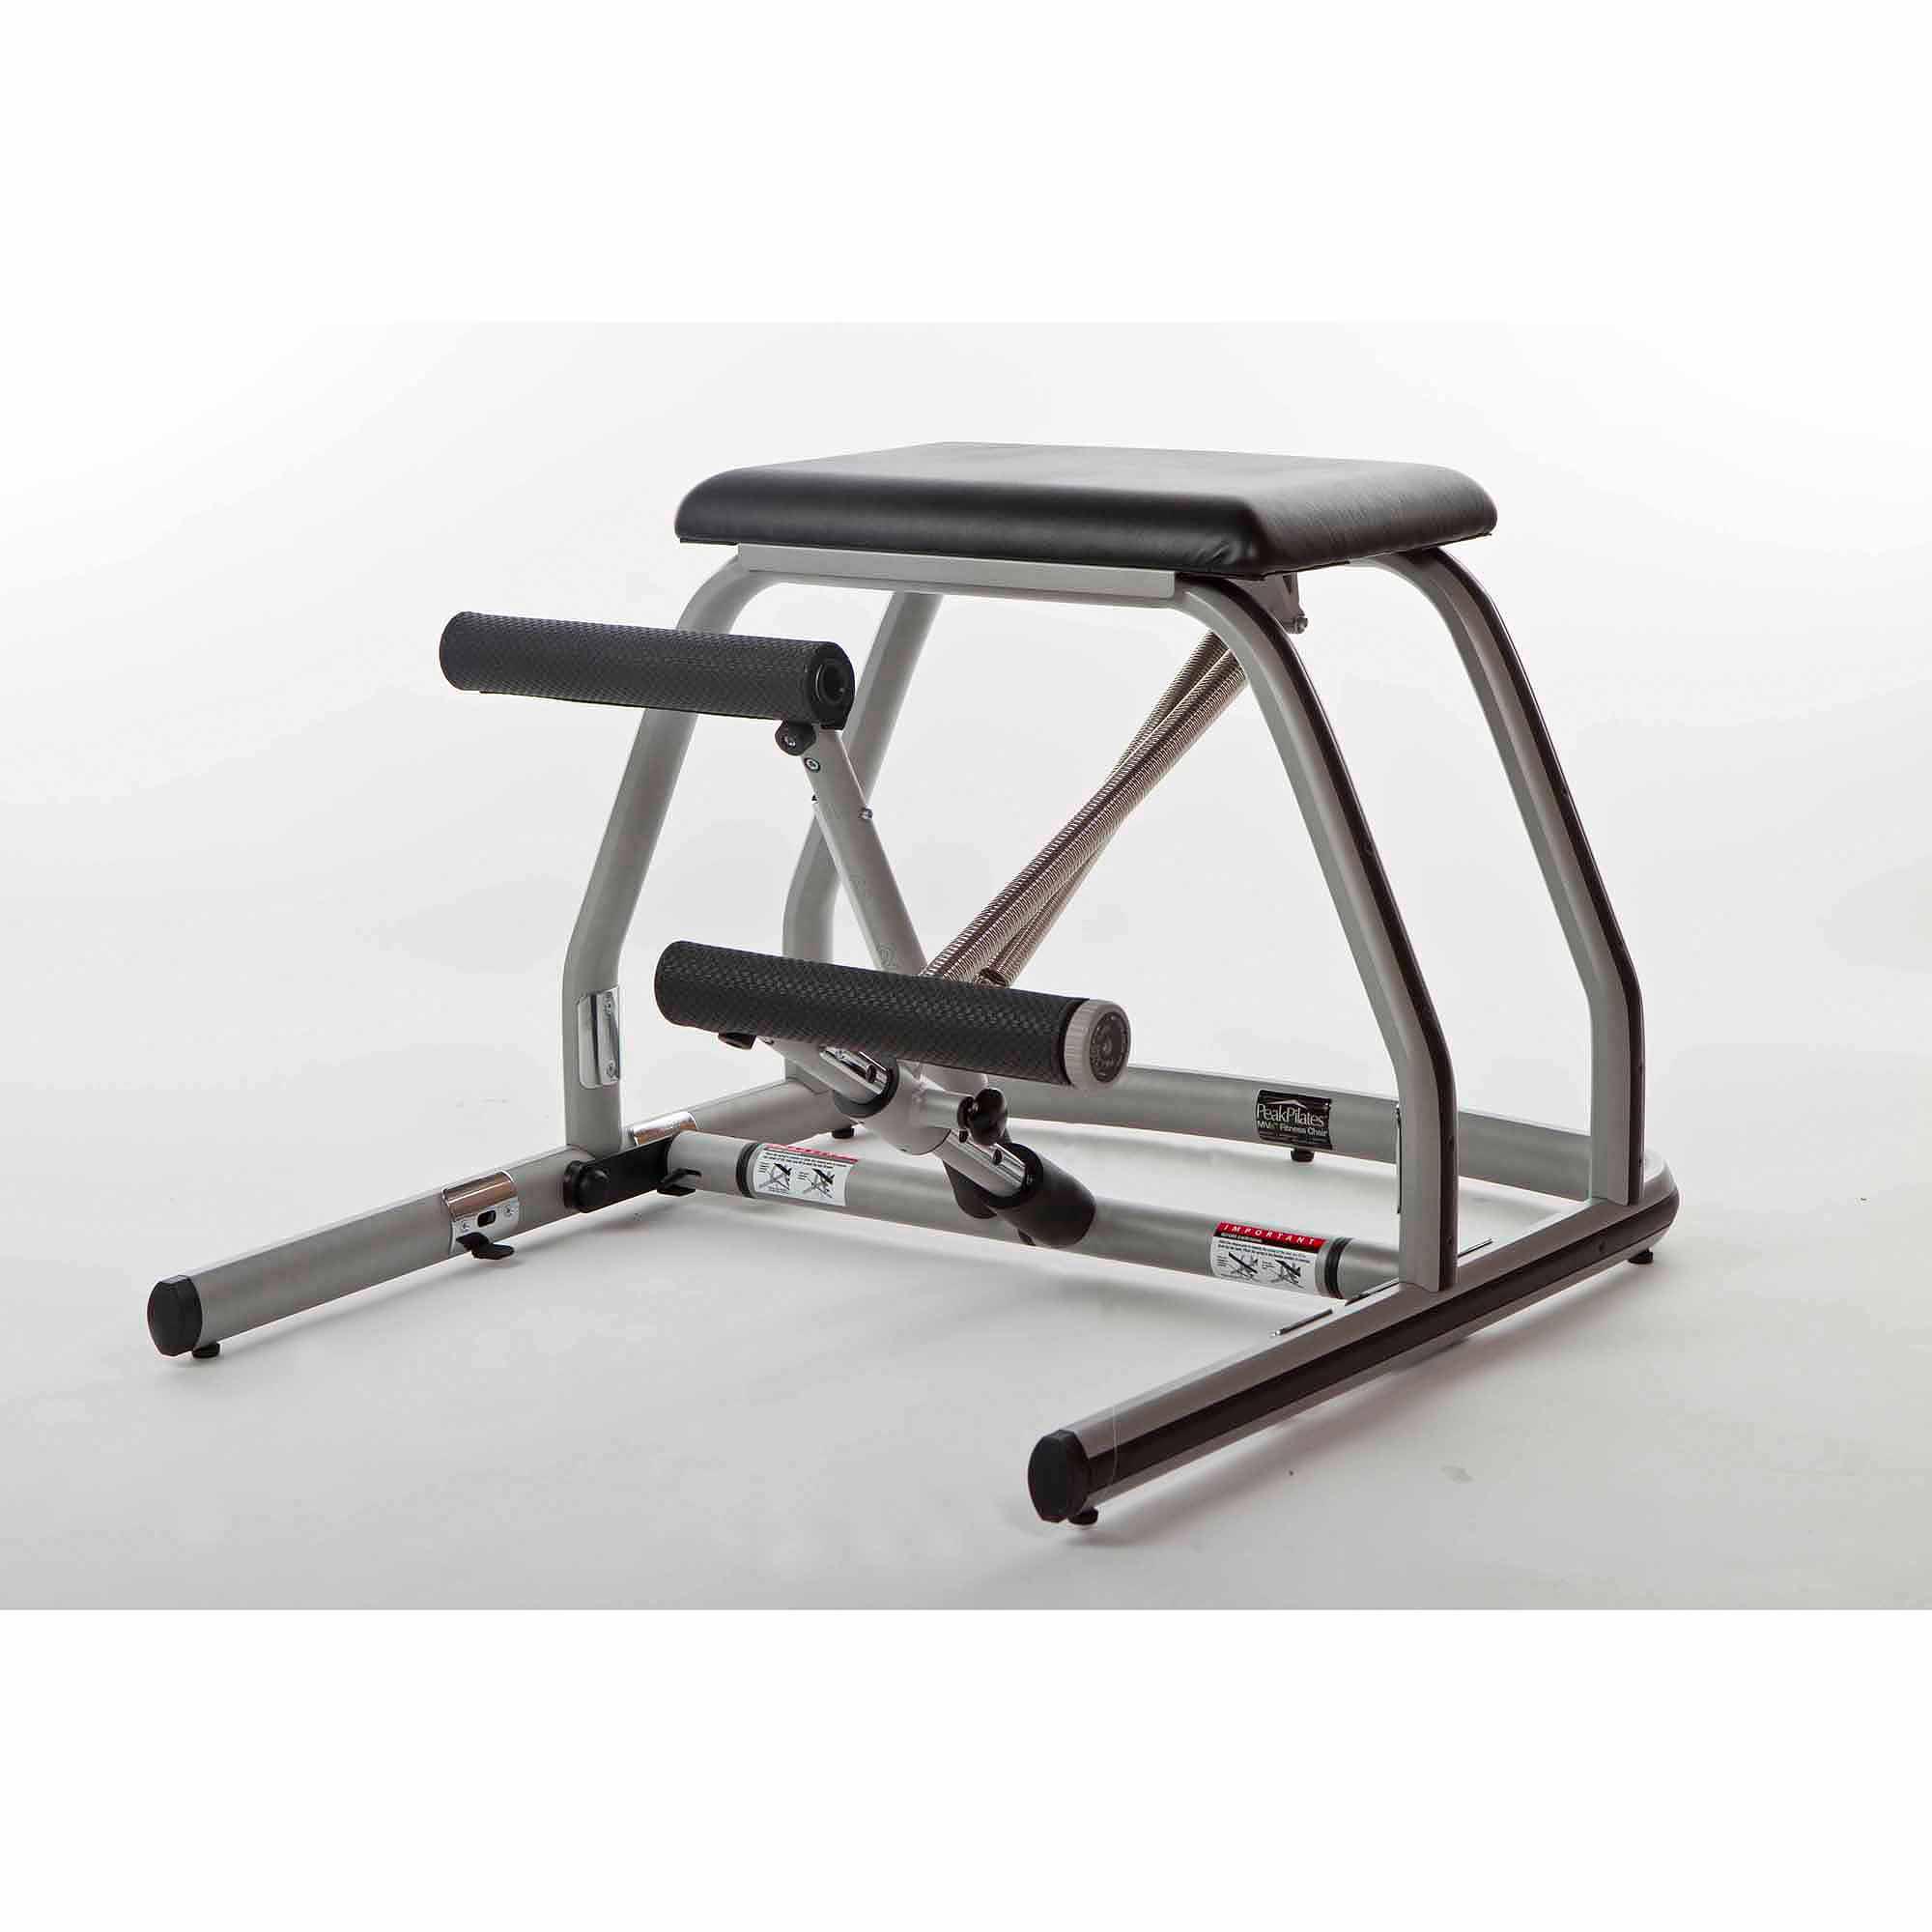 Peak Pilates MVe Fitness Chair with Split-Pedal